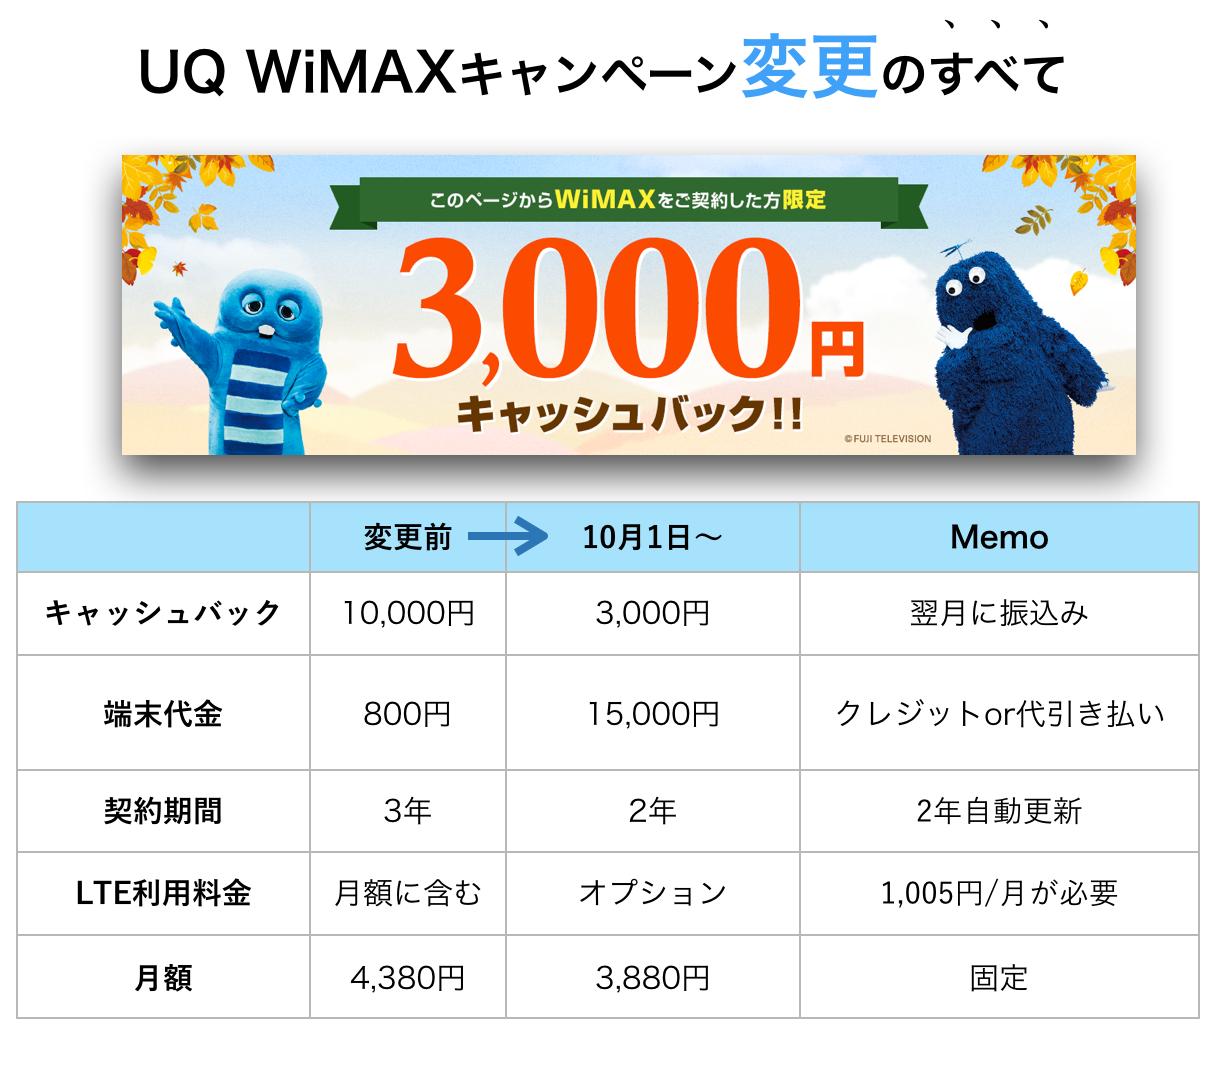 uqwimaxキャンペーン詳細データ